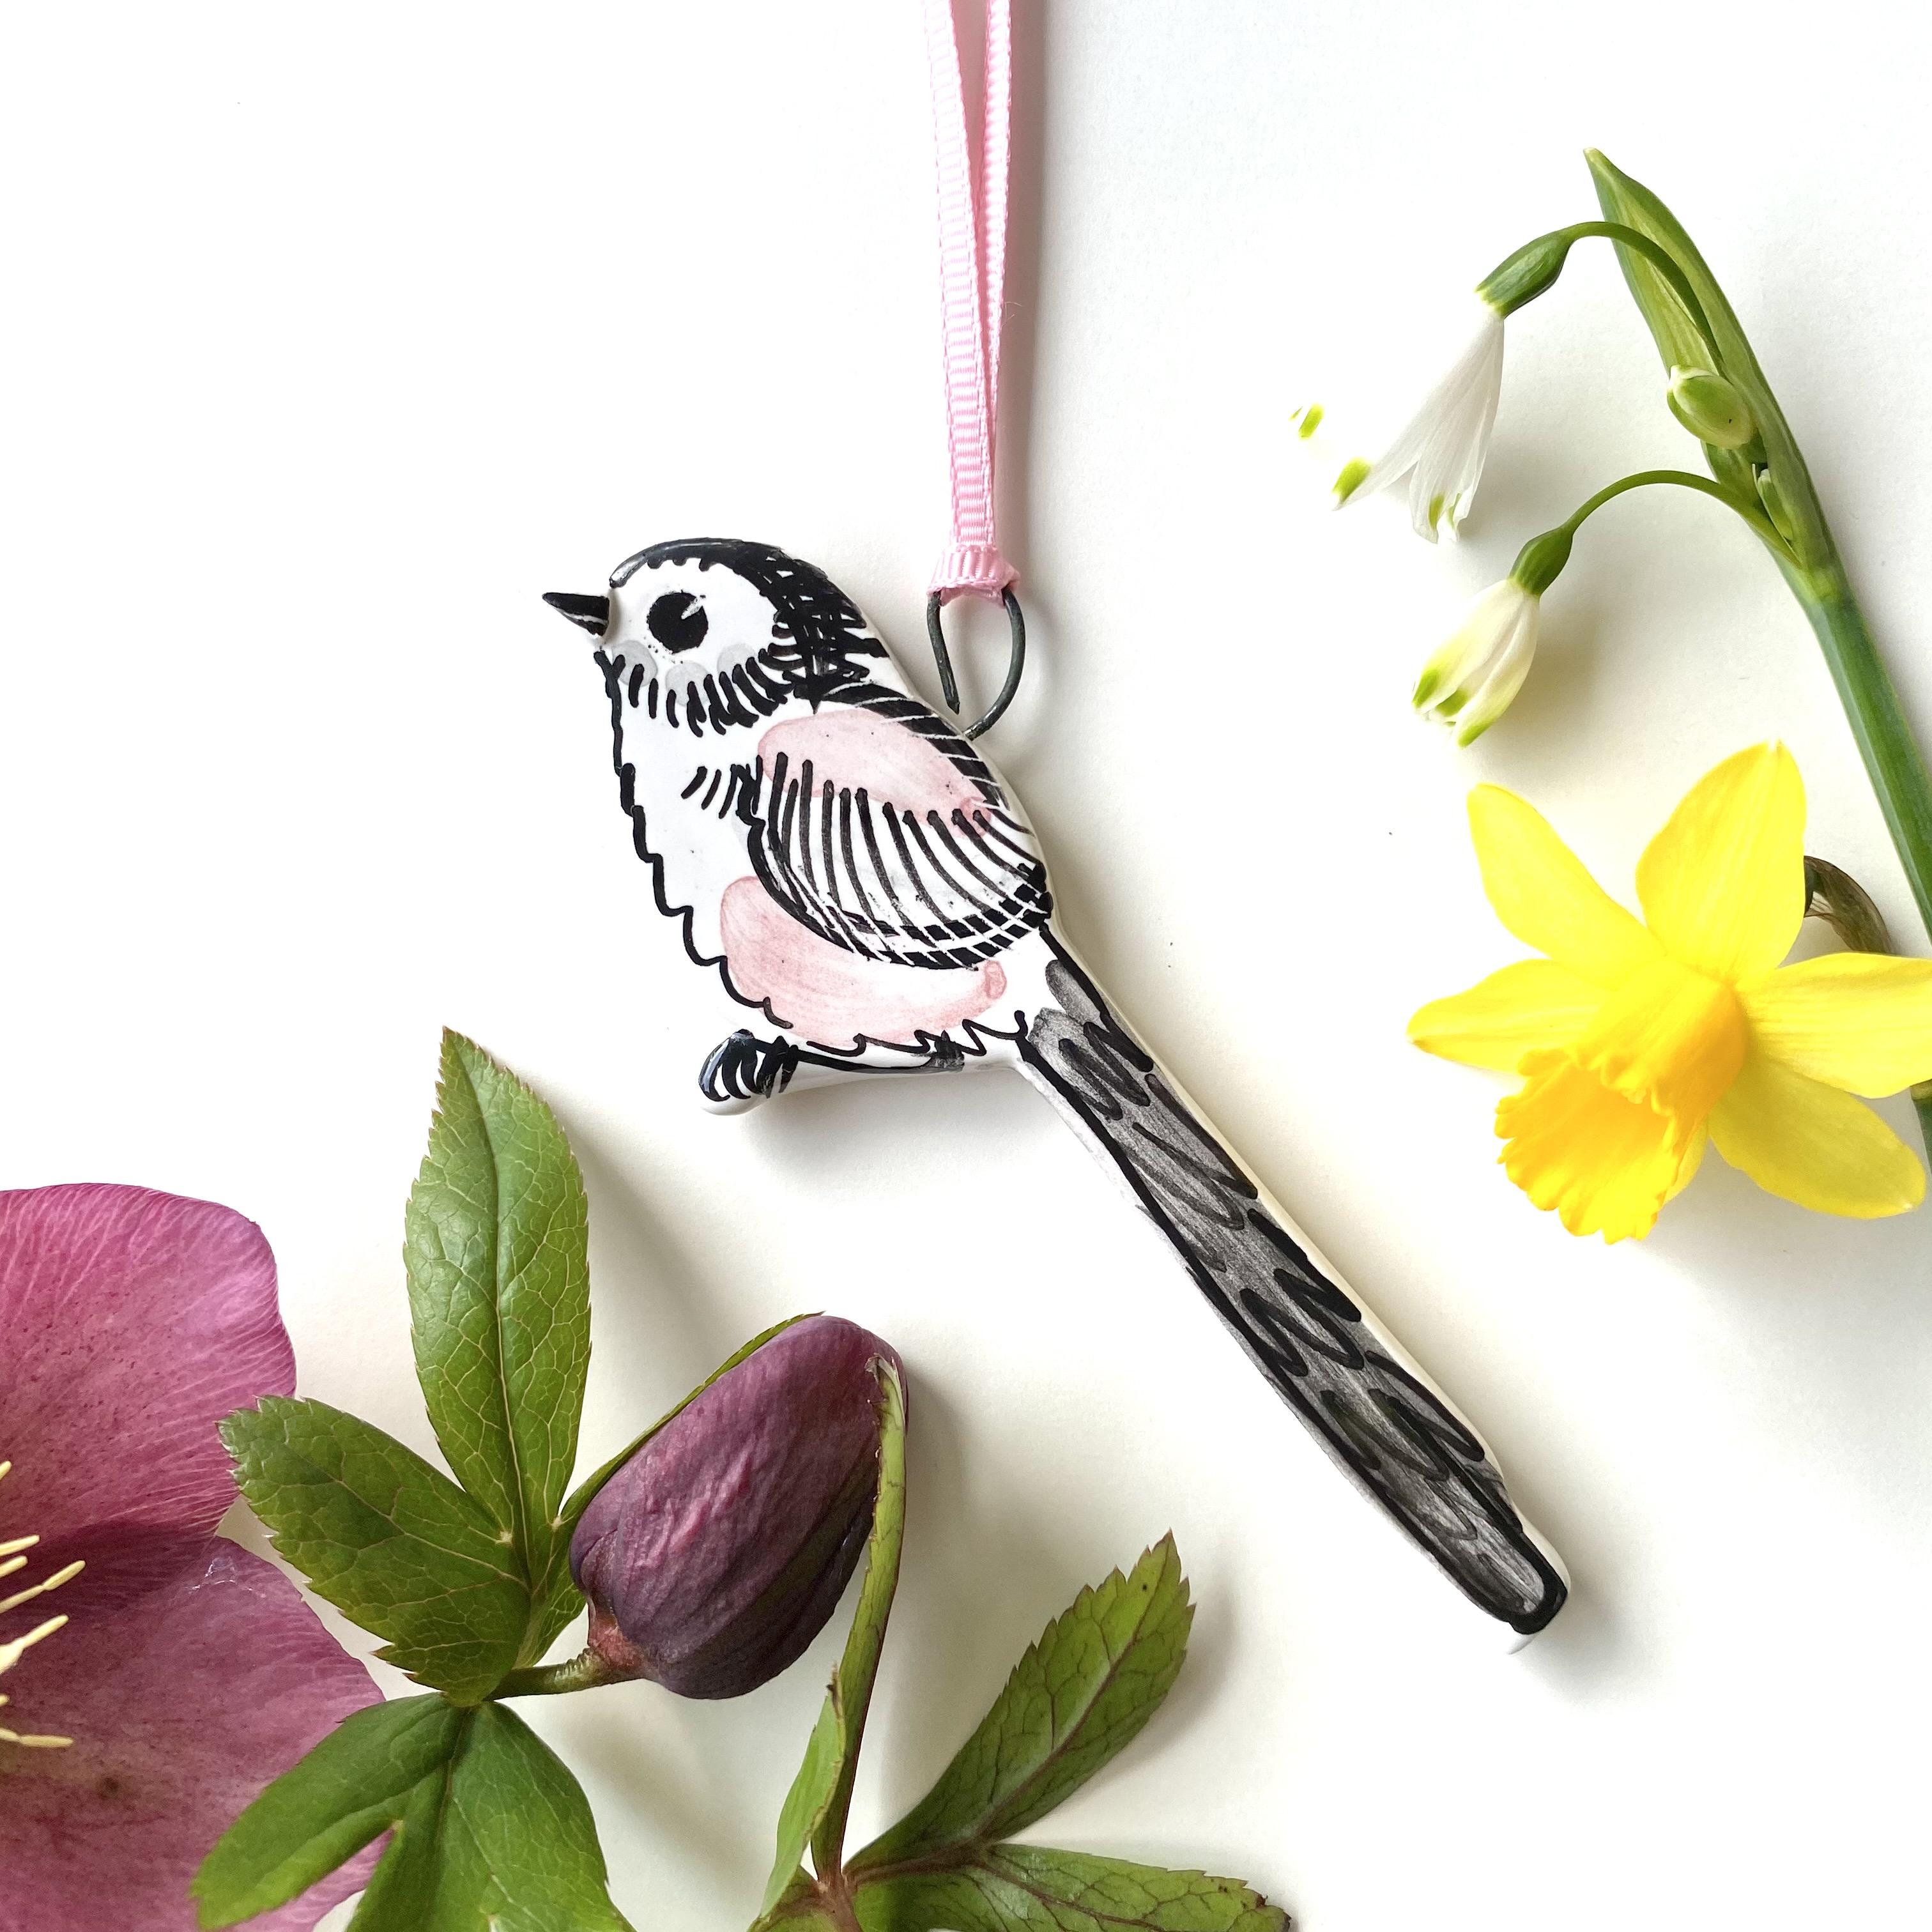 Louise Crookenden-Johnson hanging bird